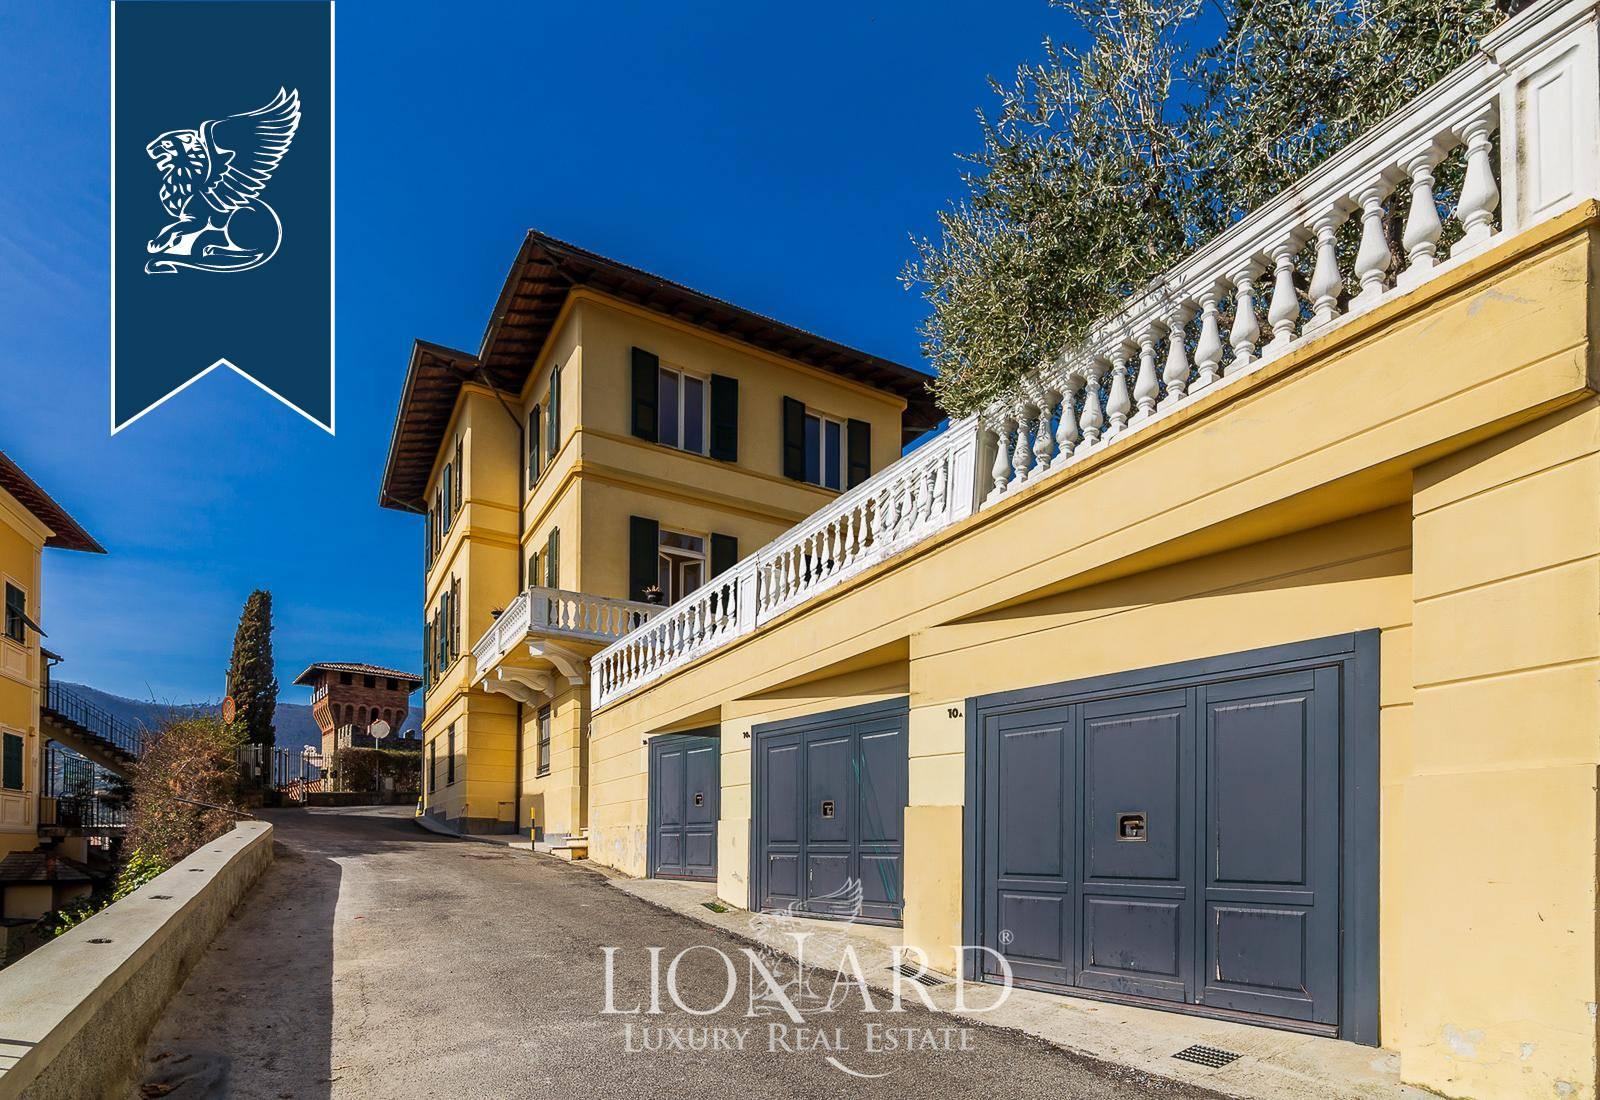 Villa in Vendita a Santa Margherita Ligure: 0 locali, 500 mq - Foto 8